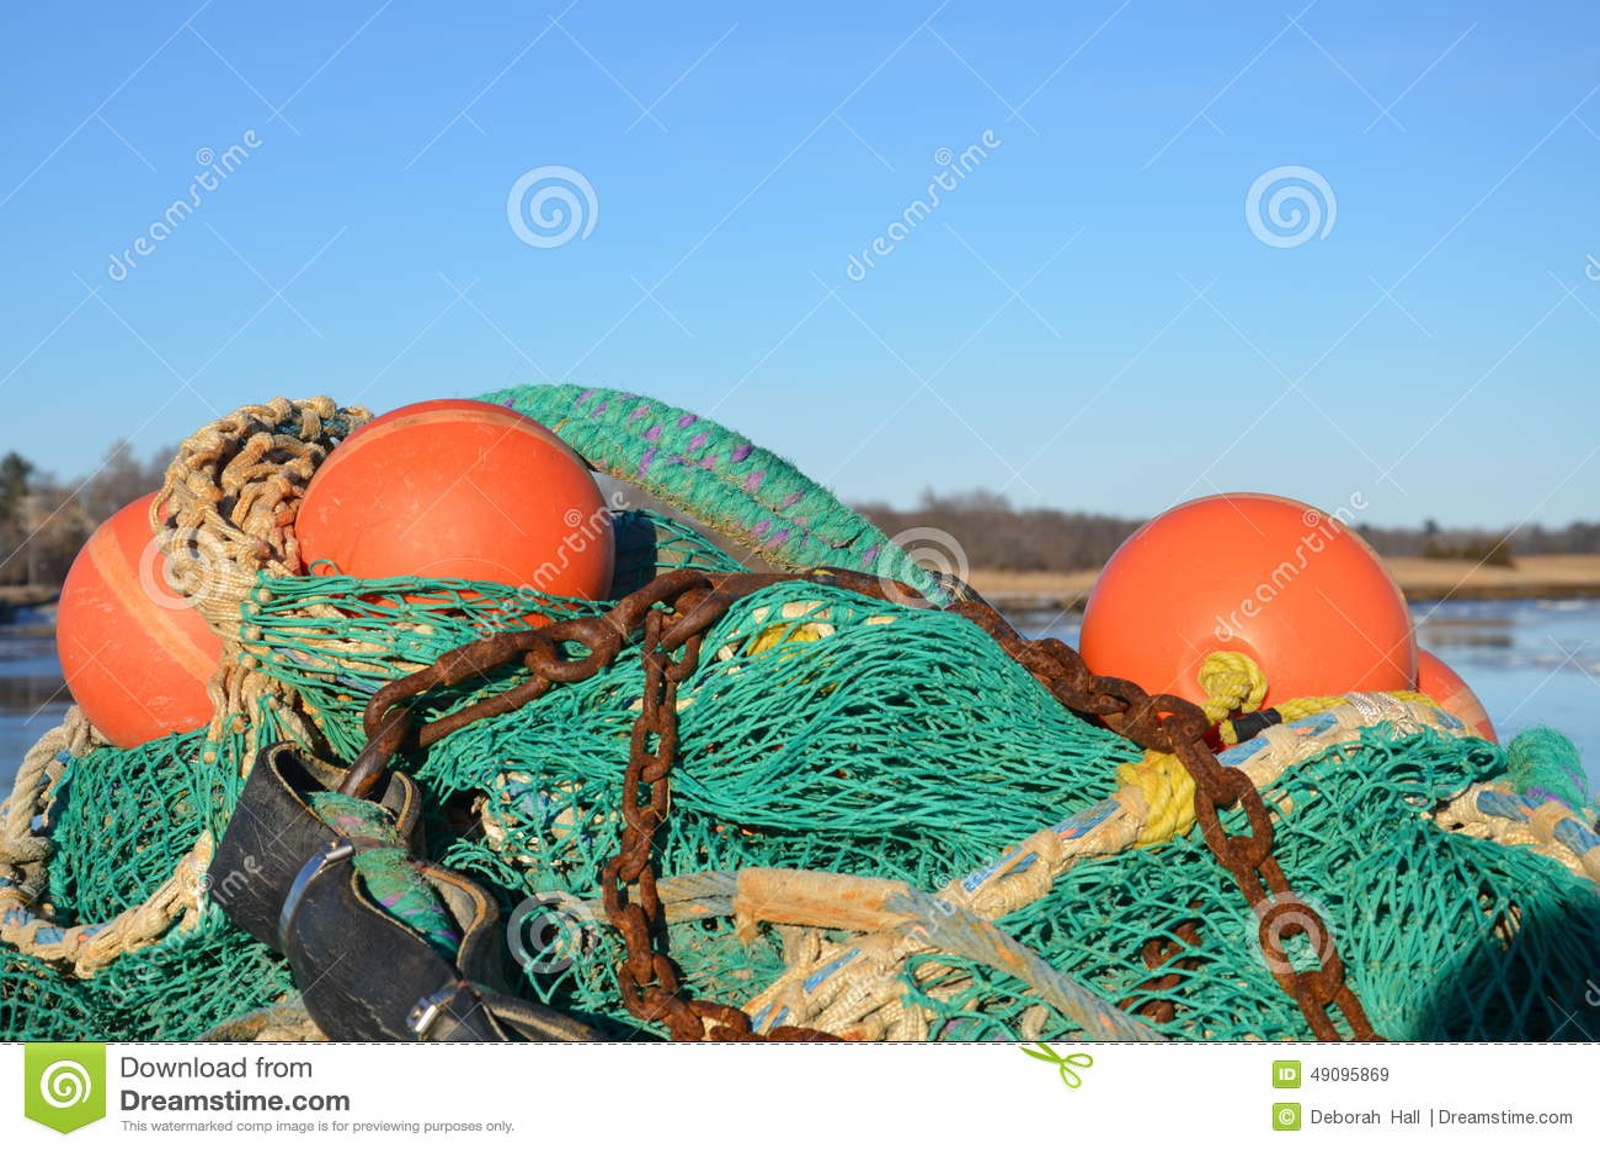 Fishing gear near the new england coast for Winter fishing gear